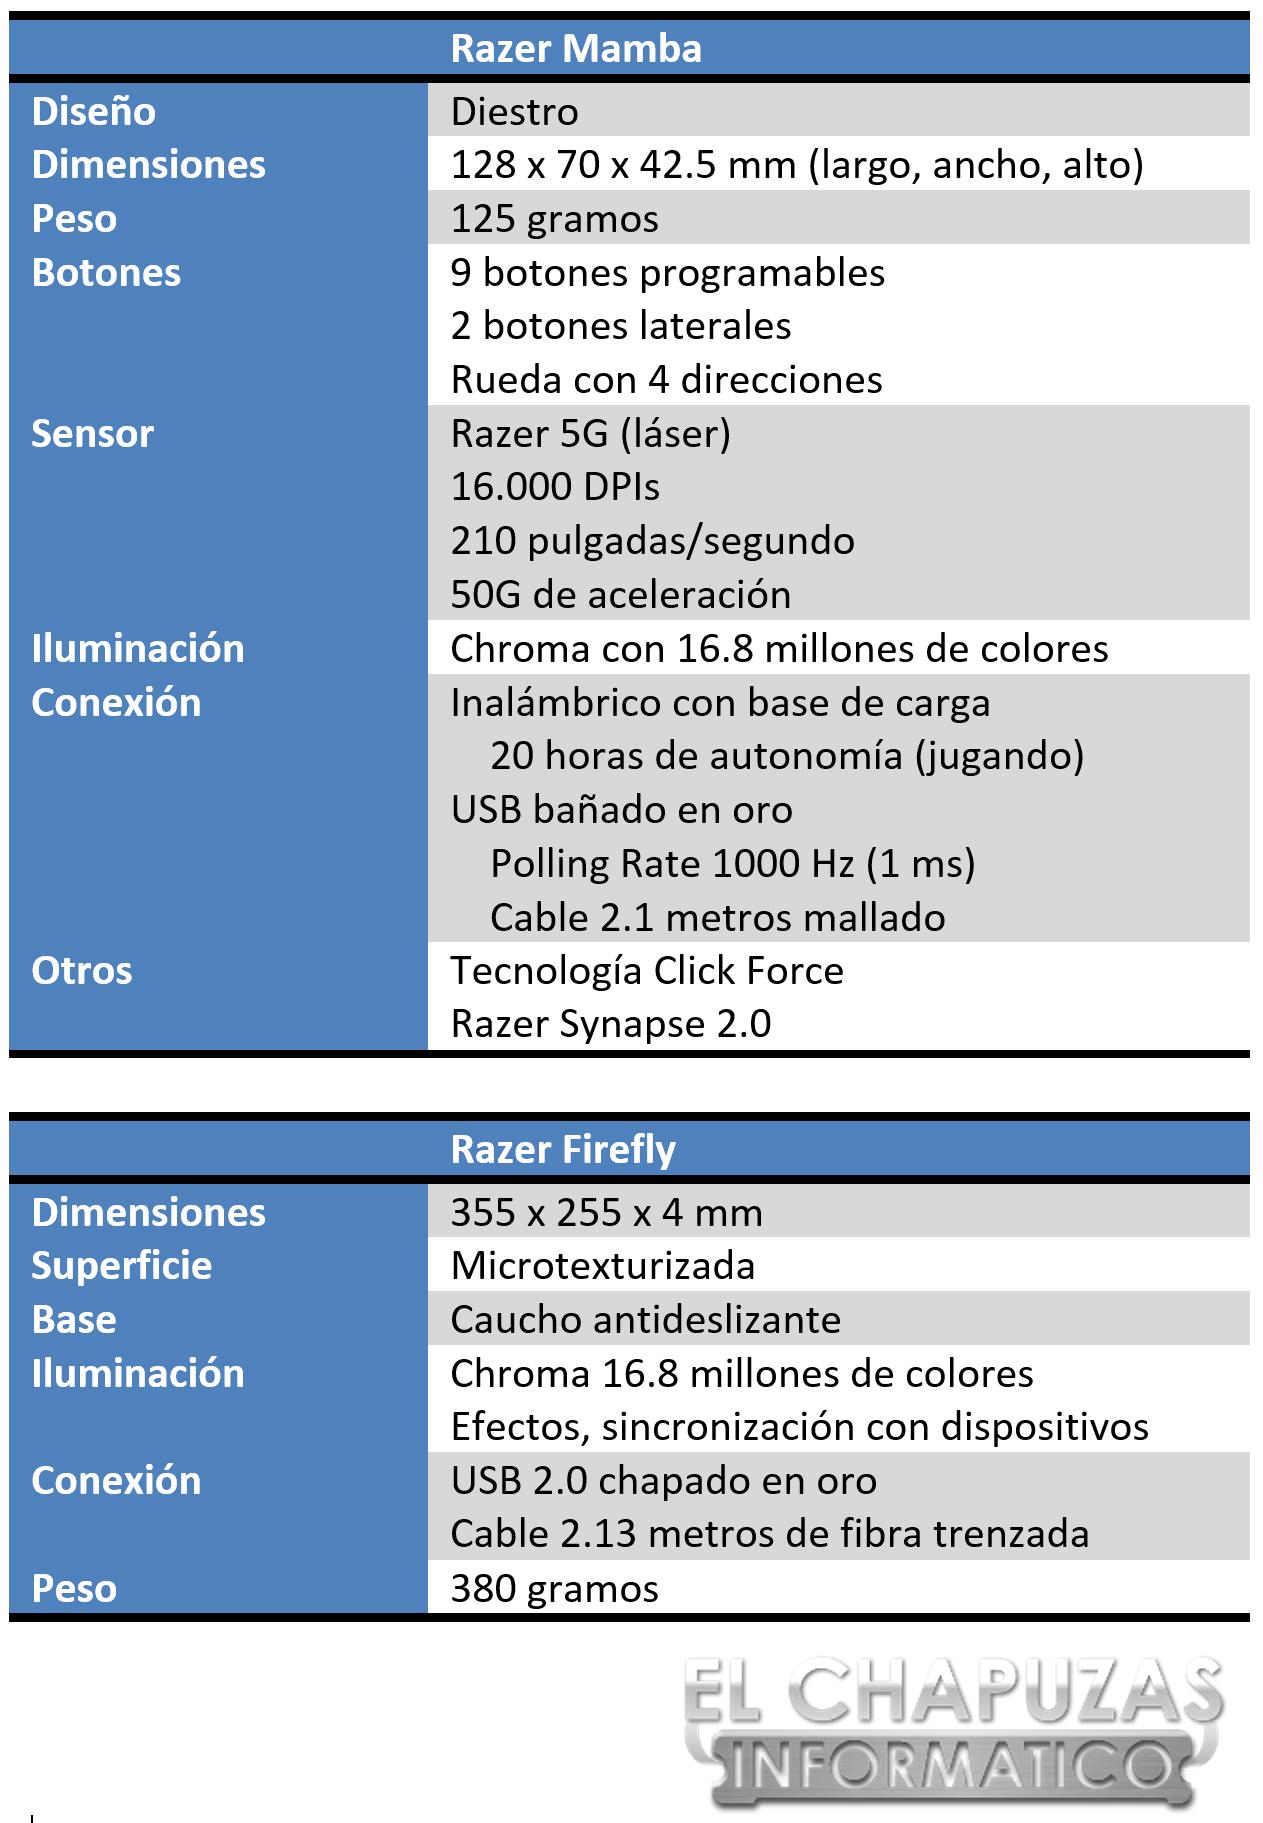 Razer Mamba + Firefly Especificaciones